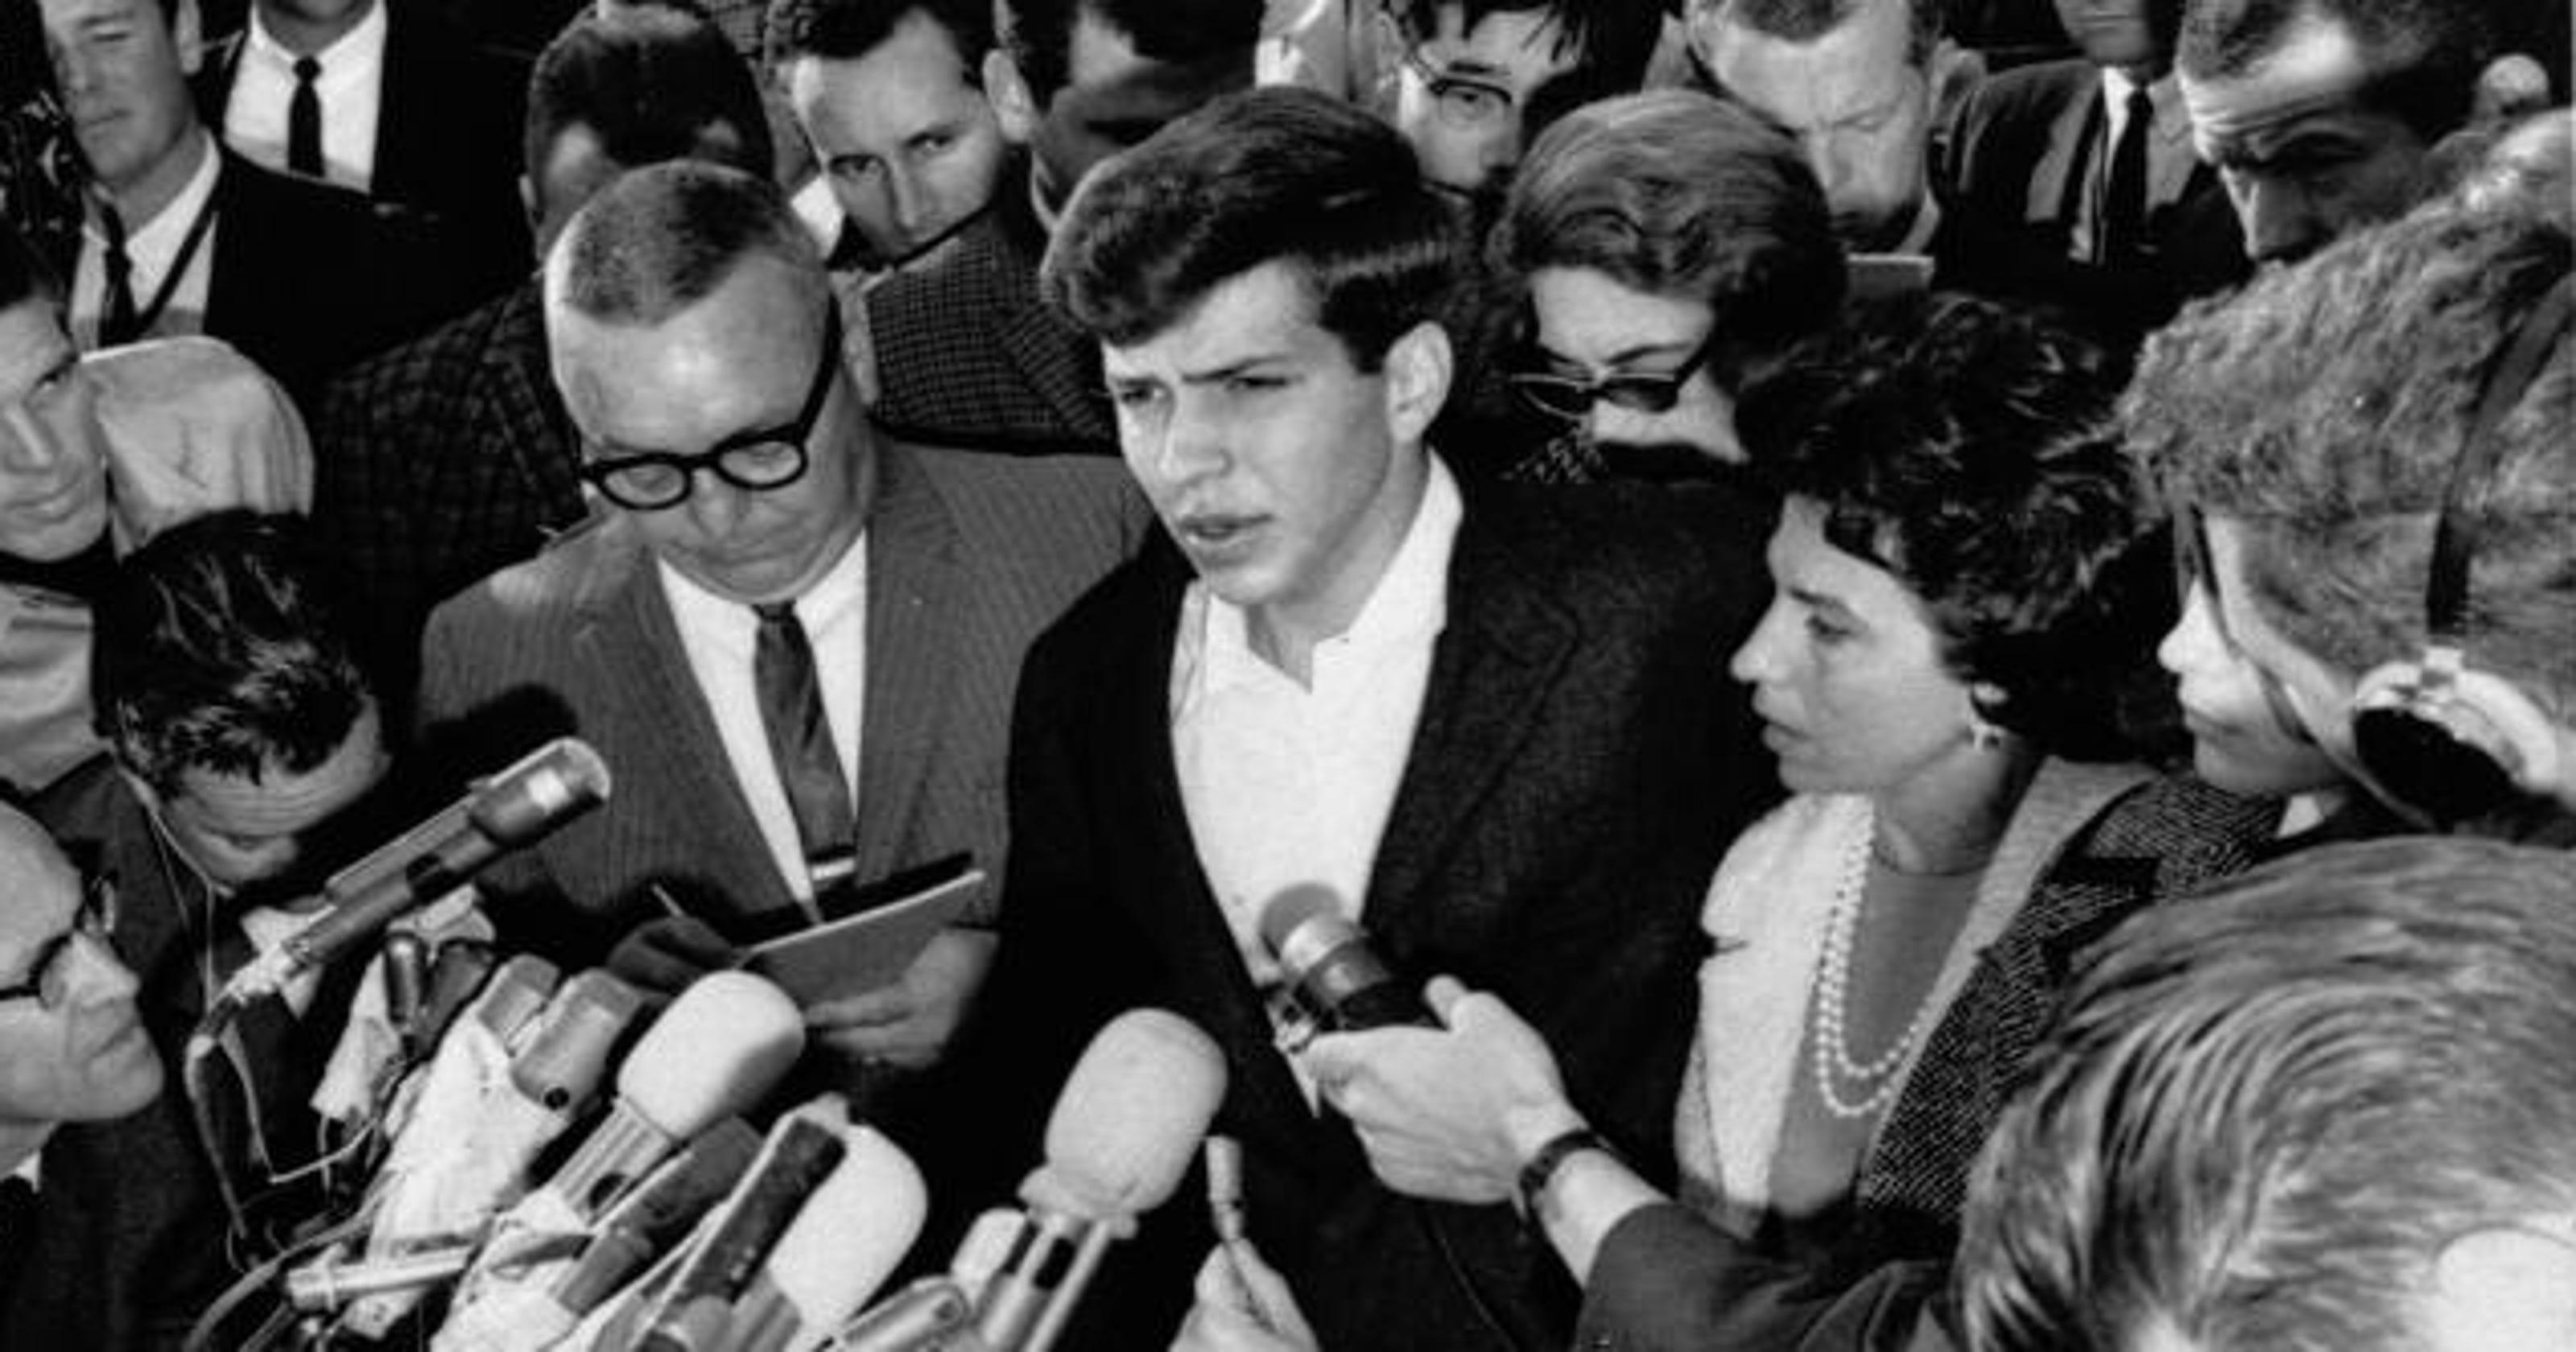 Frank Sinatra Jr , son of Ol' Blue Eyes, dies